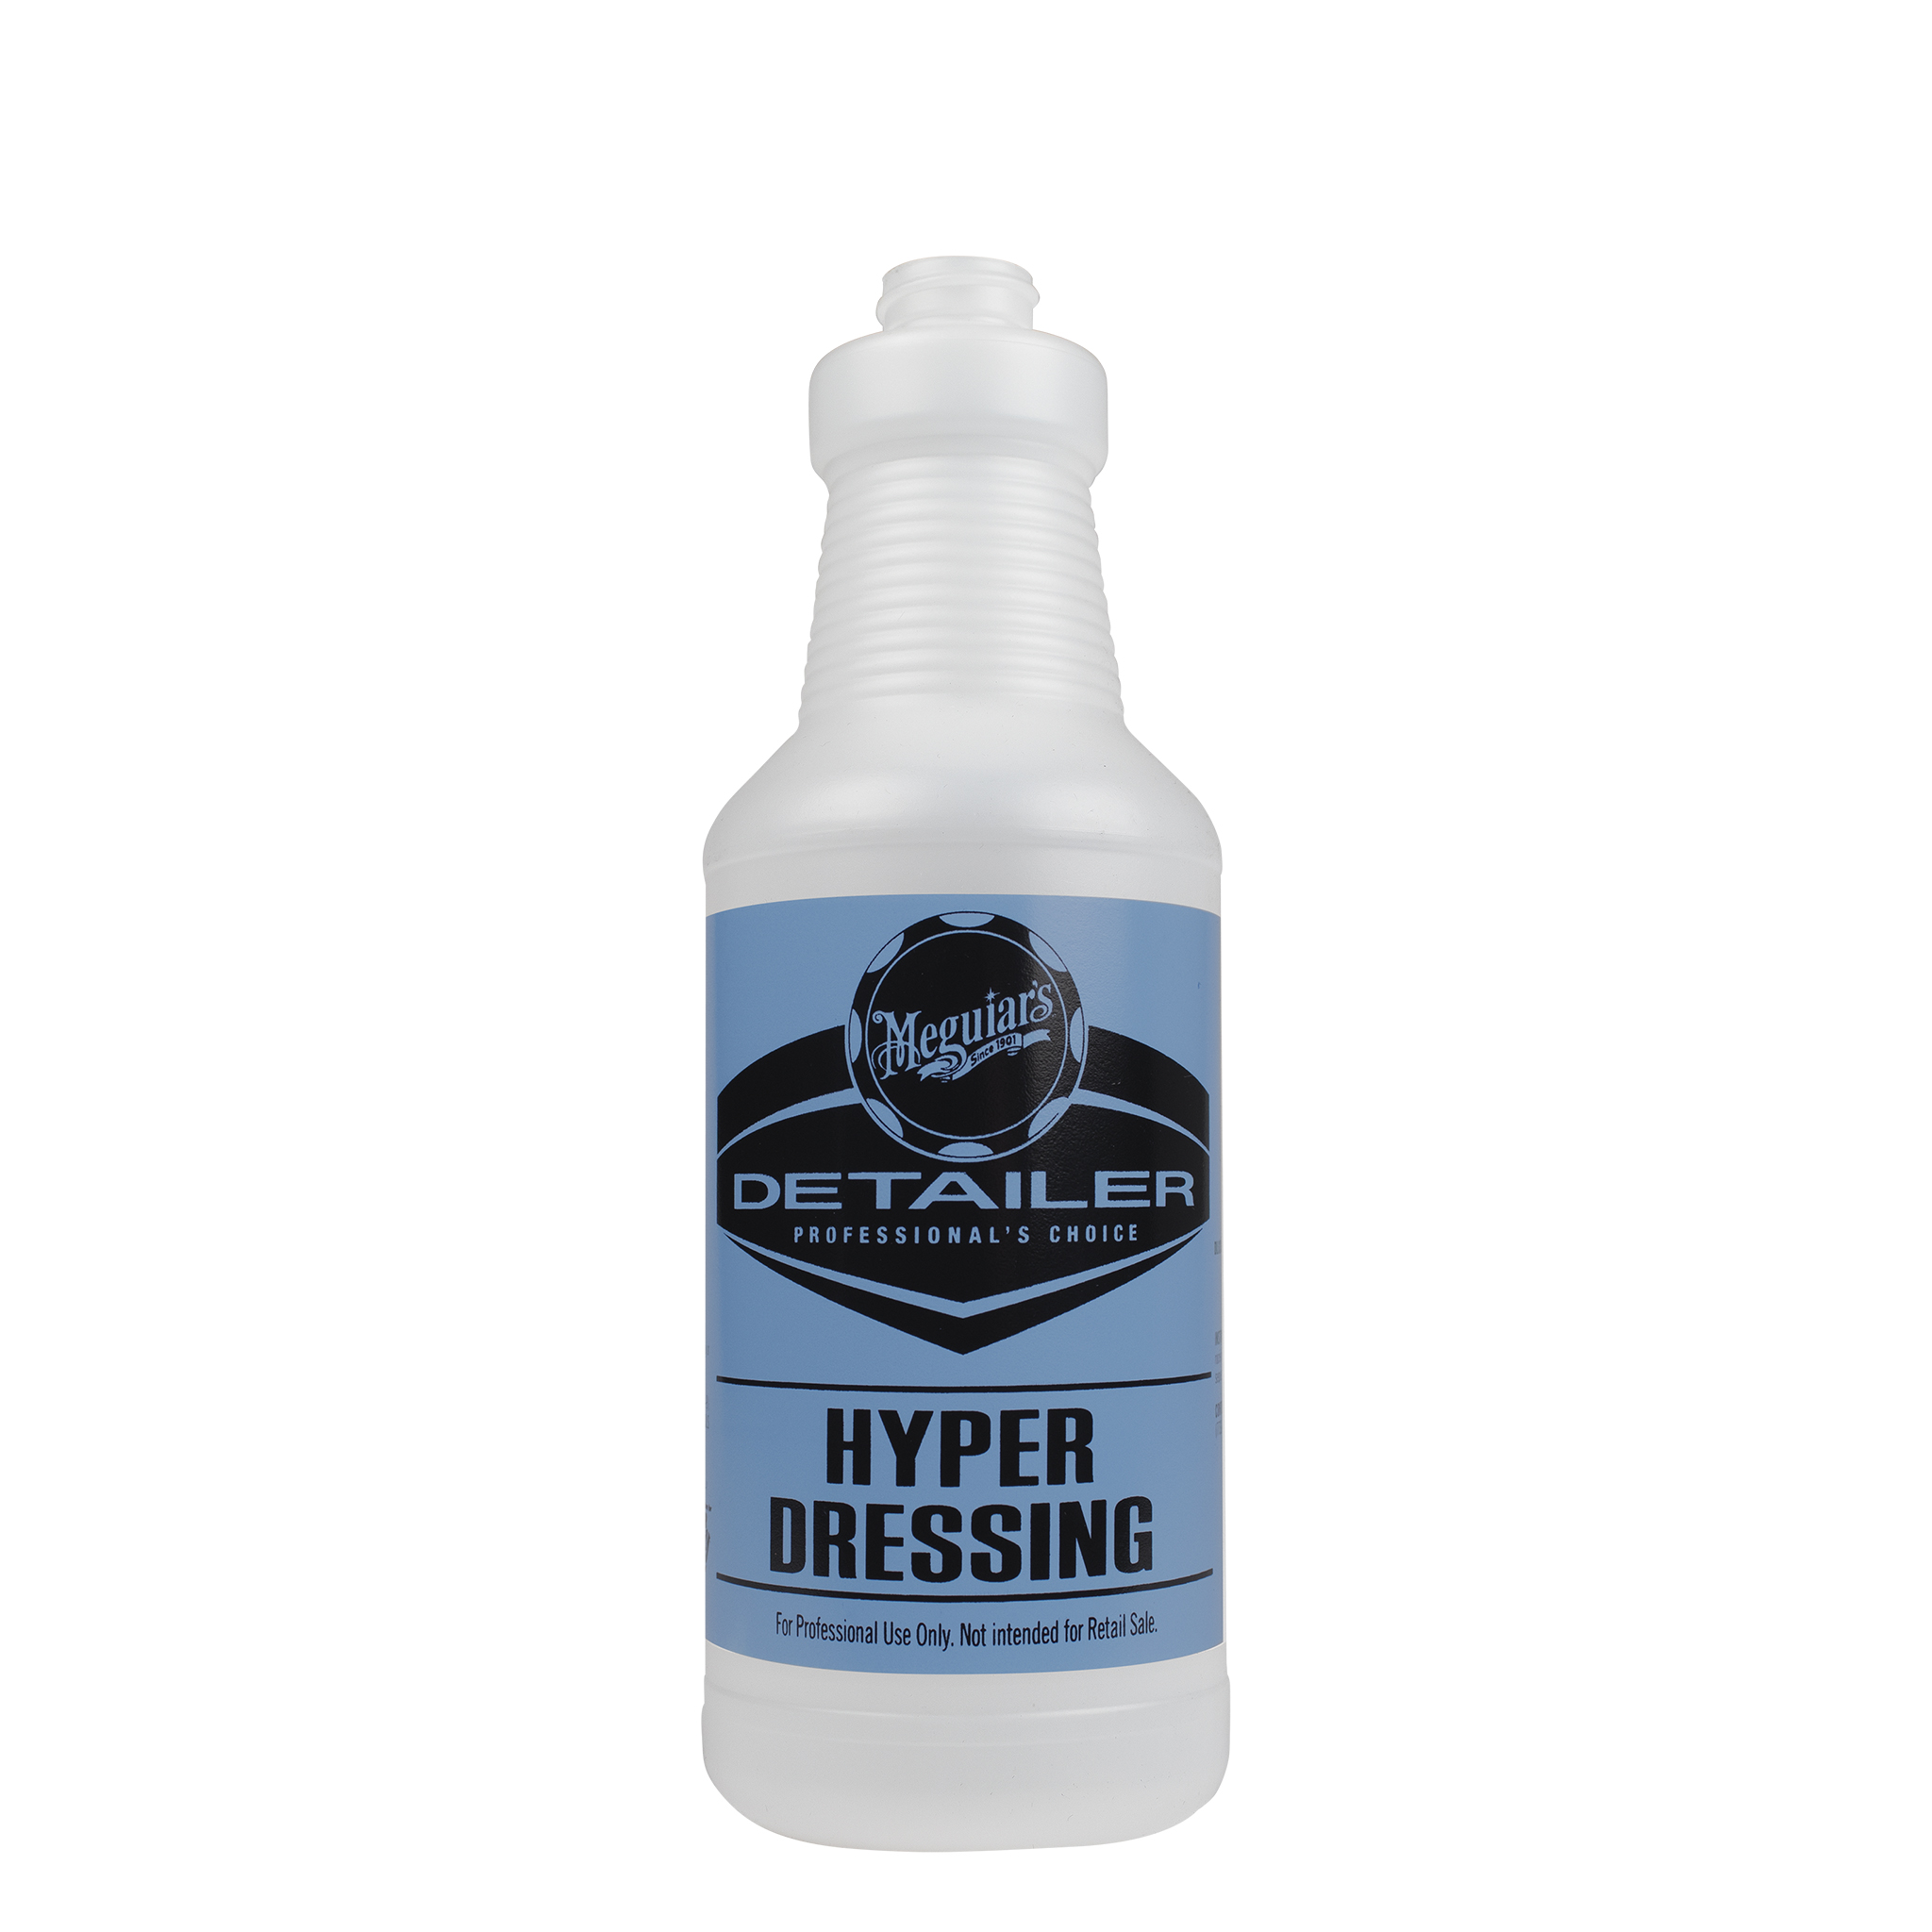 Meguiars Sprayflaska, 1000 ml, Hyper Dressing